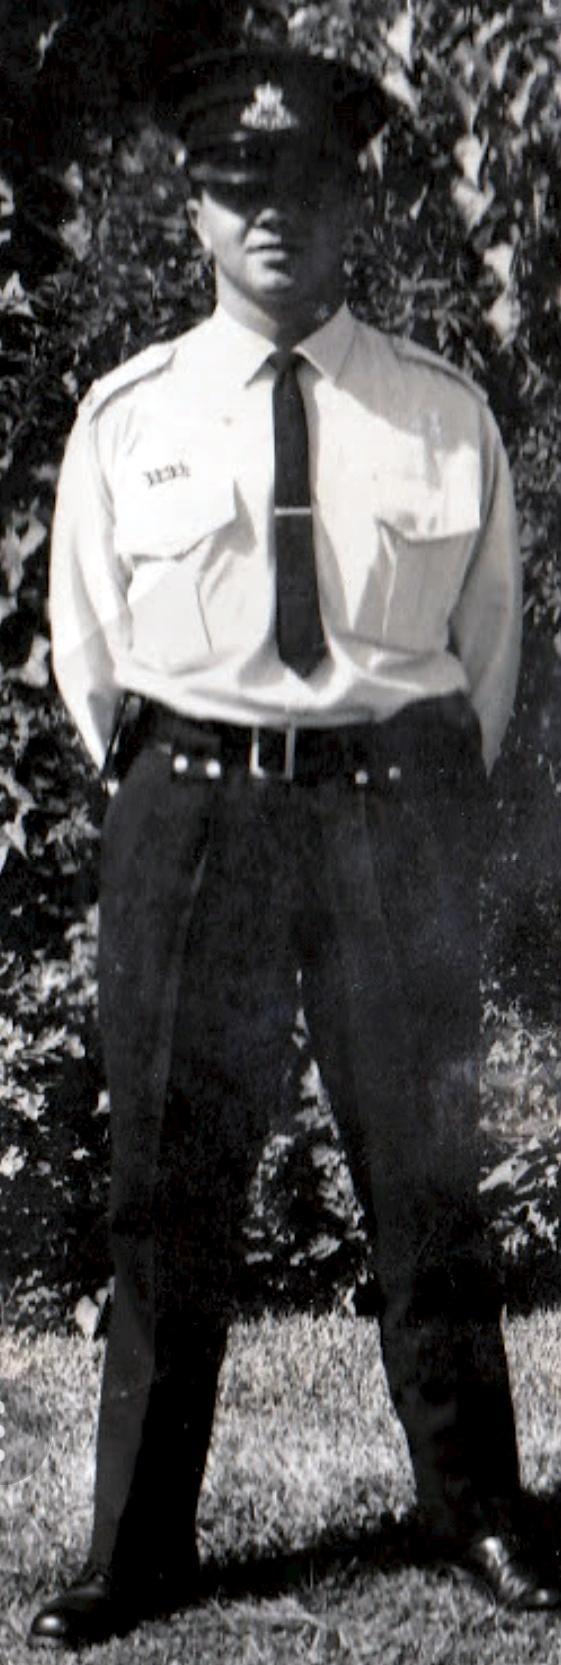 Adolfas JABLONSKIS